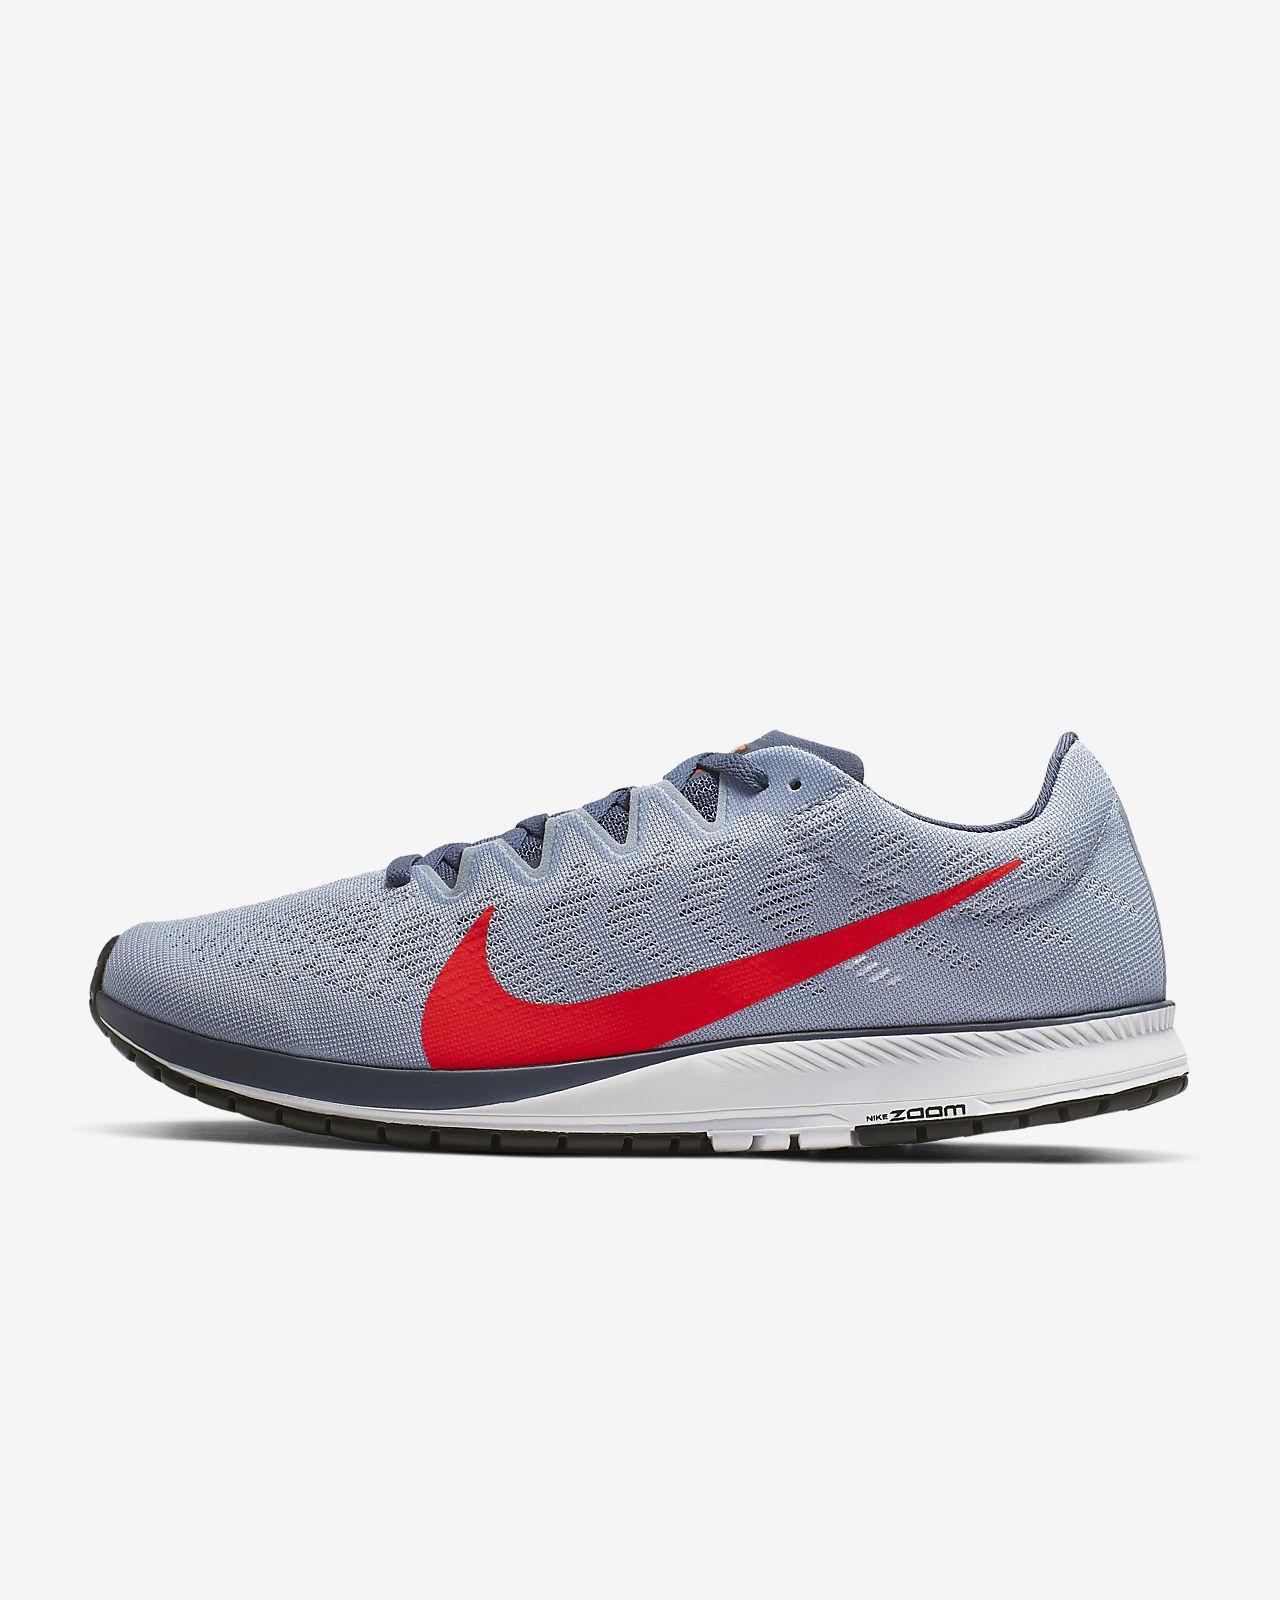 8d976127047618 Zoom 7 Air Streak LaufschuhDe Nike gfy76YbvI